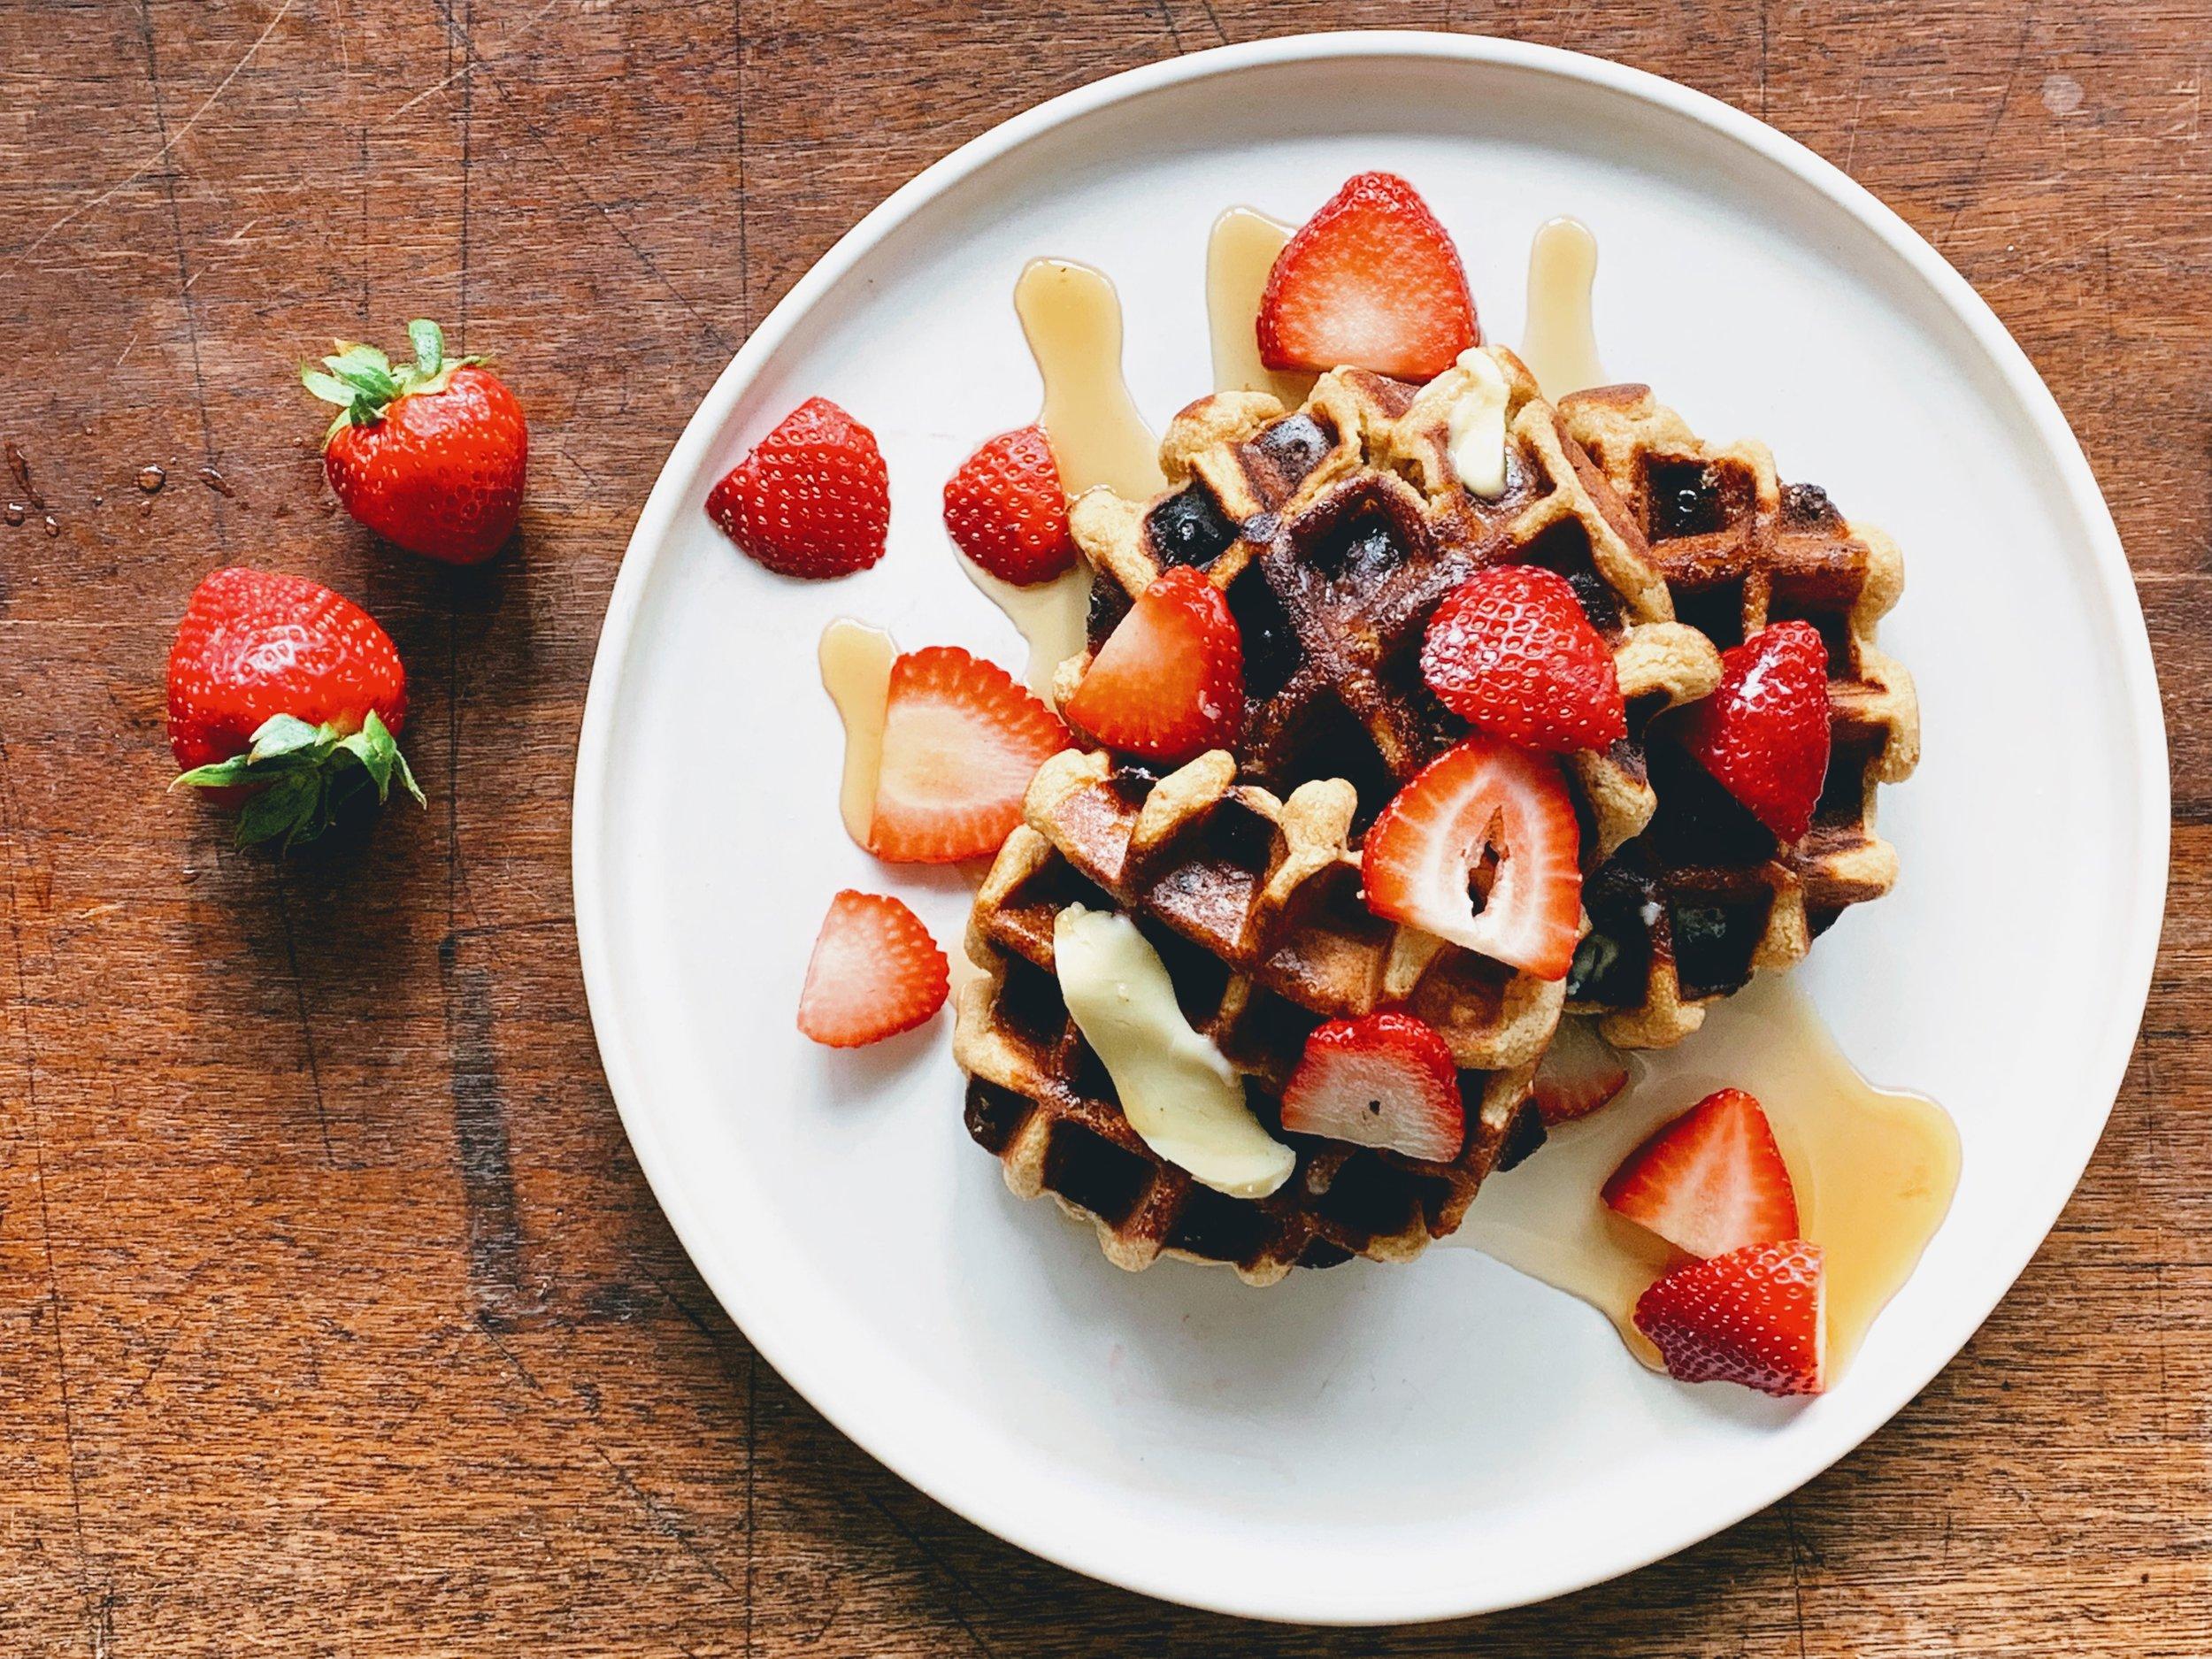 Gluten Free Strawberry Banana Waffles